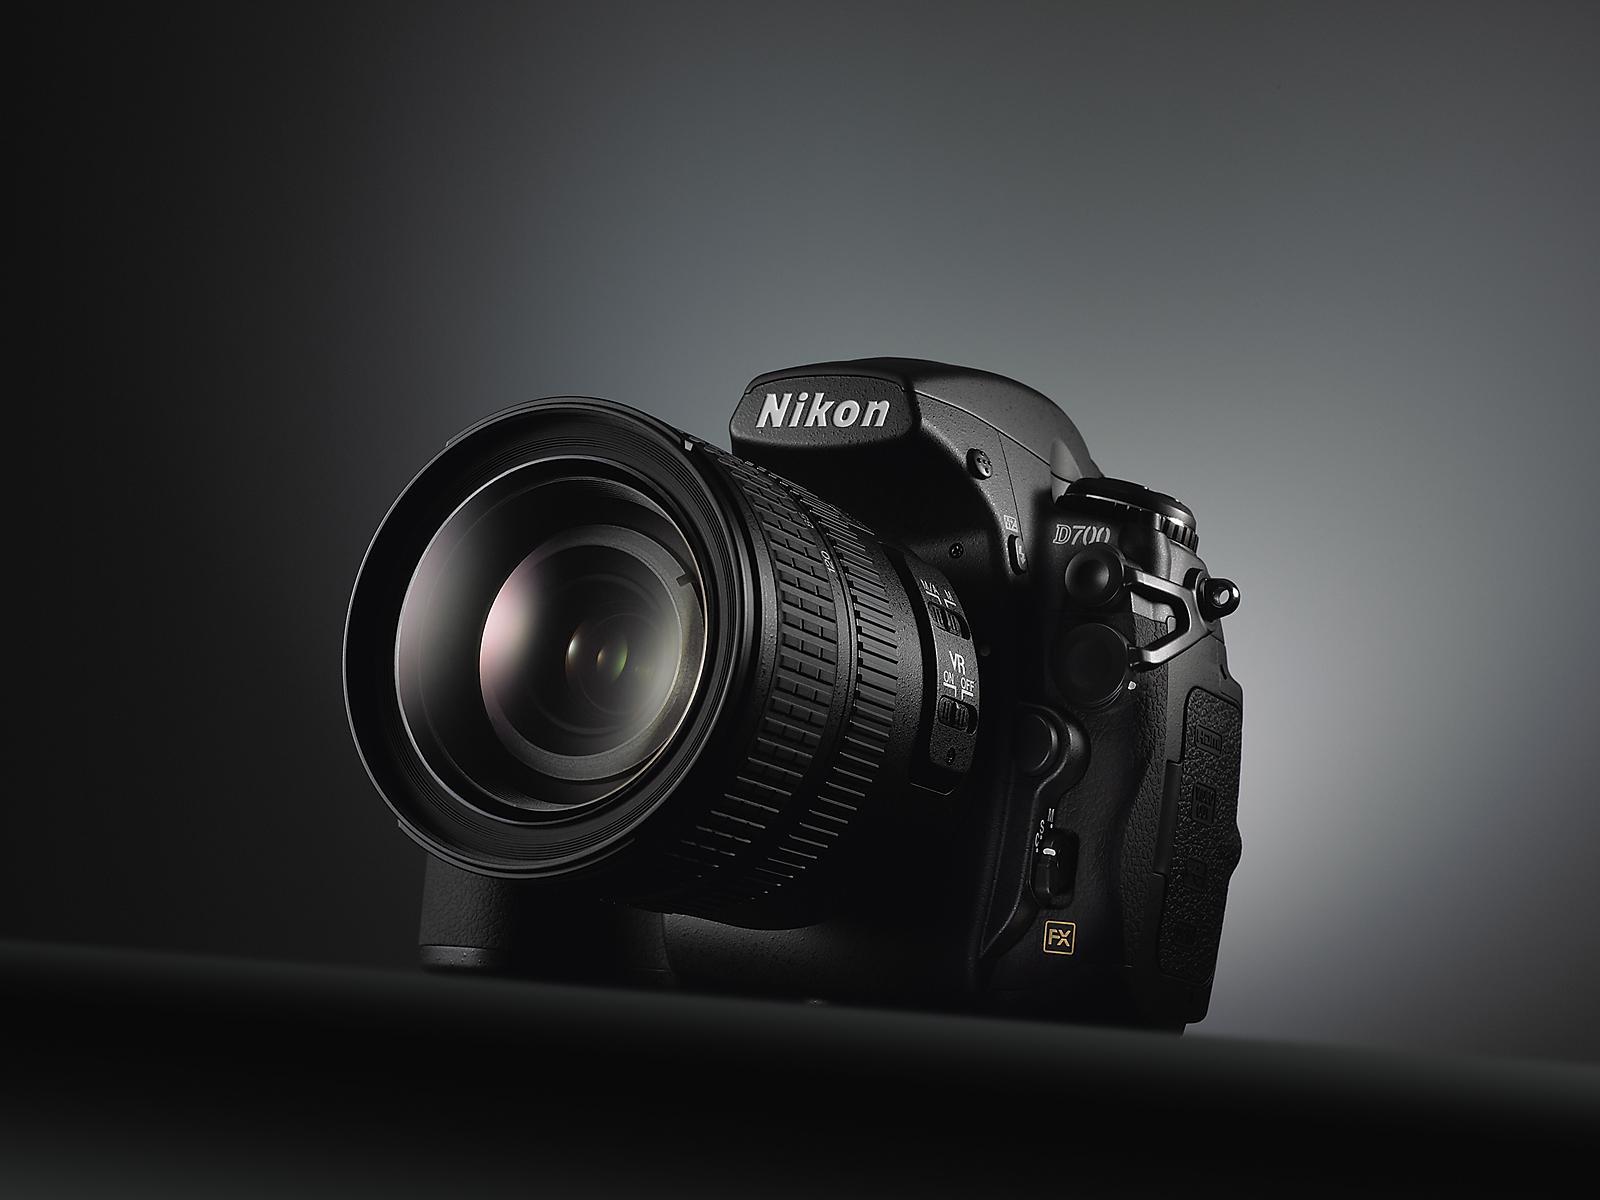 Nikon D700 - et videokamera?